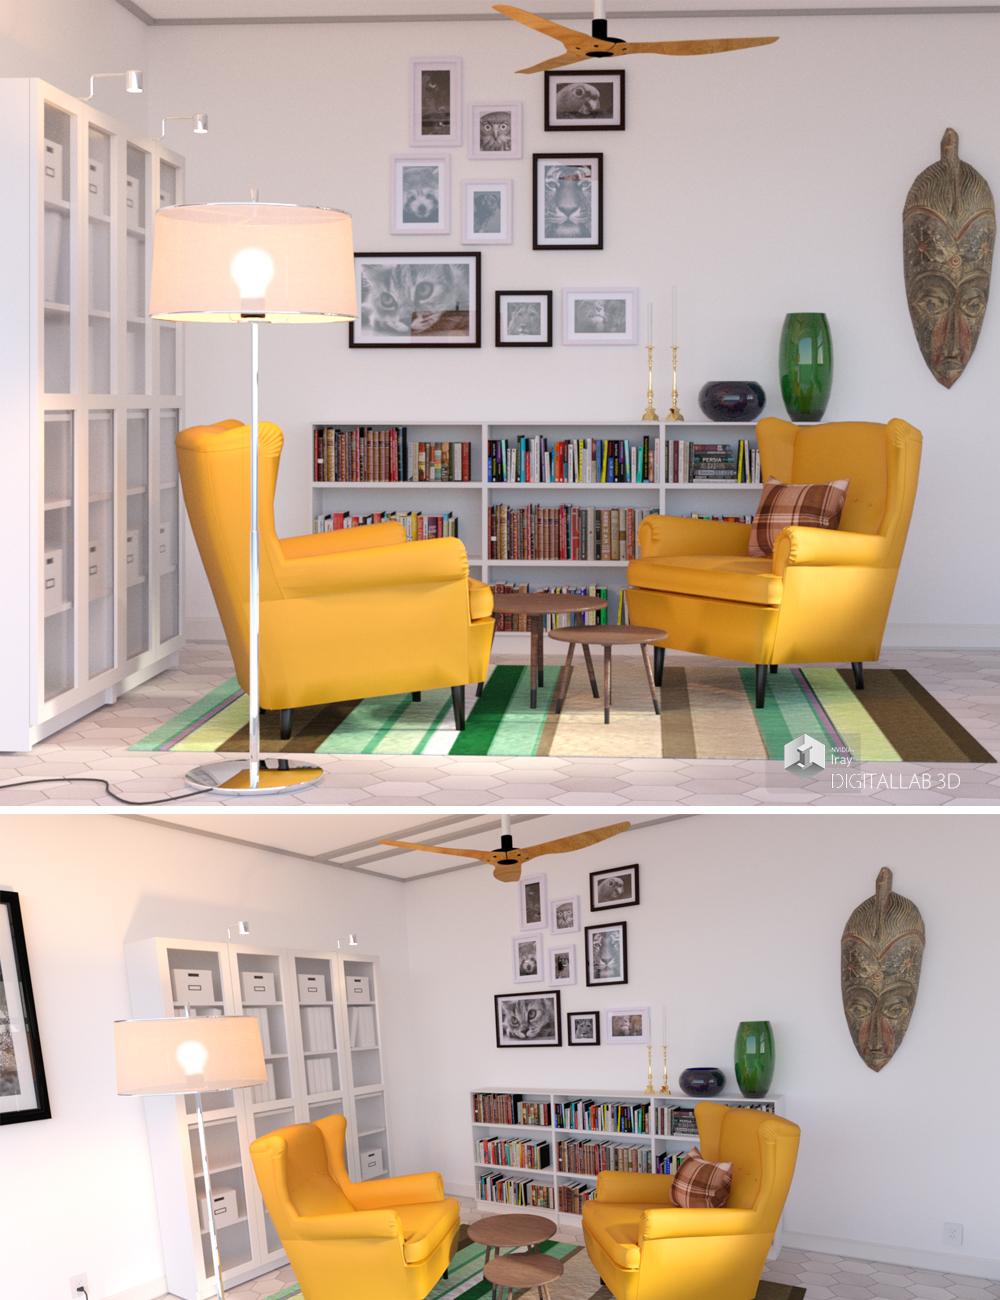 Reading Room by: Digitallab3D, 3D Models by Daz 3D